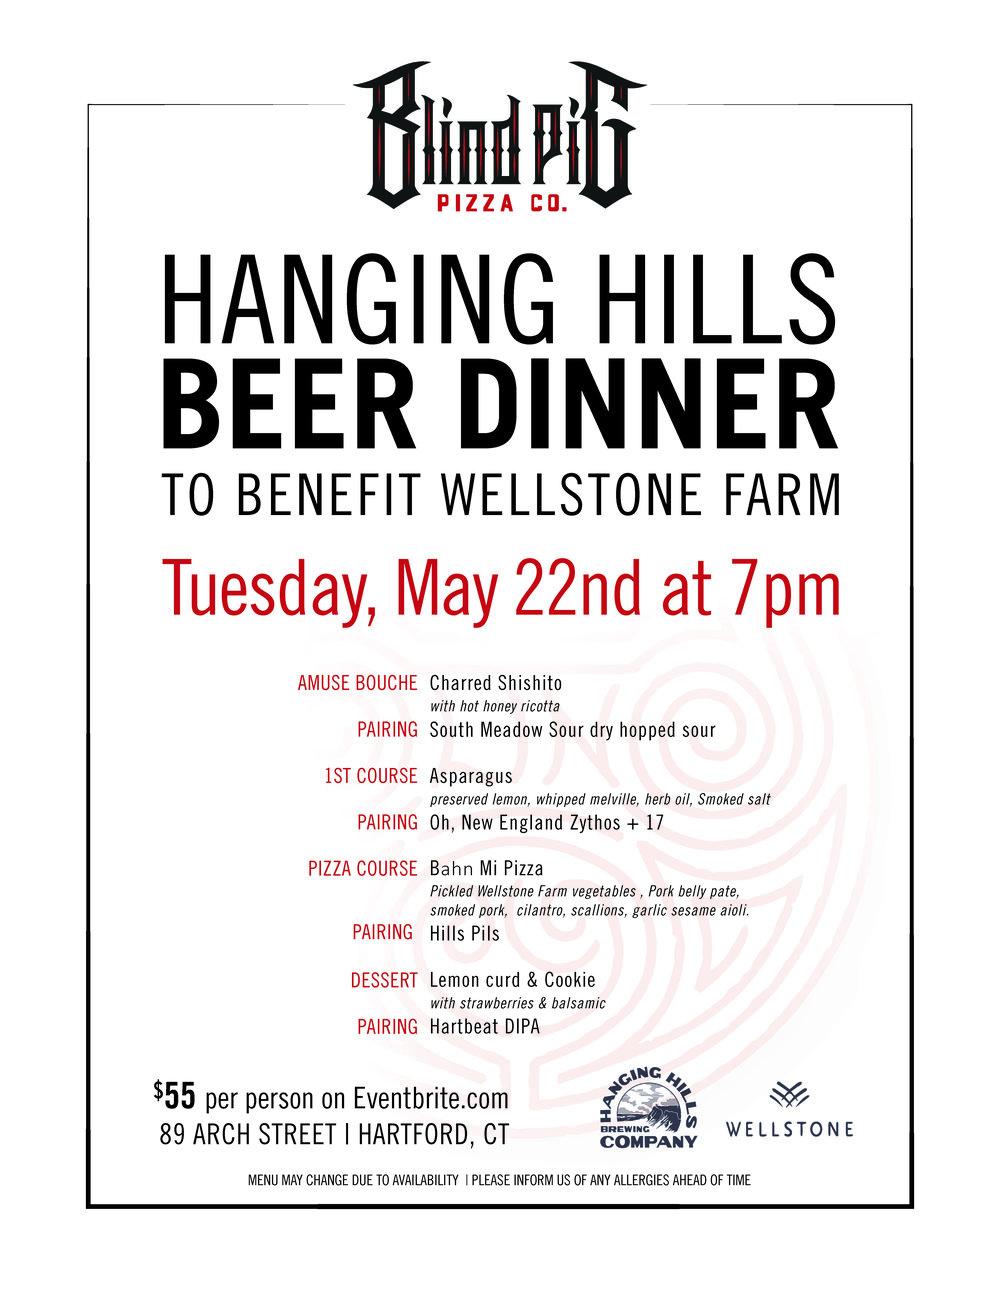 Blind Pig Hanging Hills Dinner Benefit Wellstone Farm